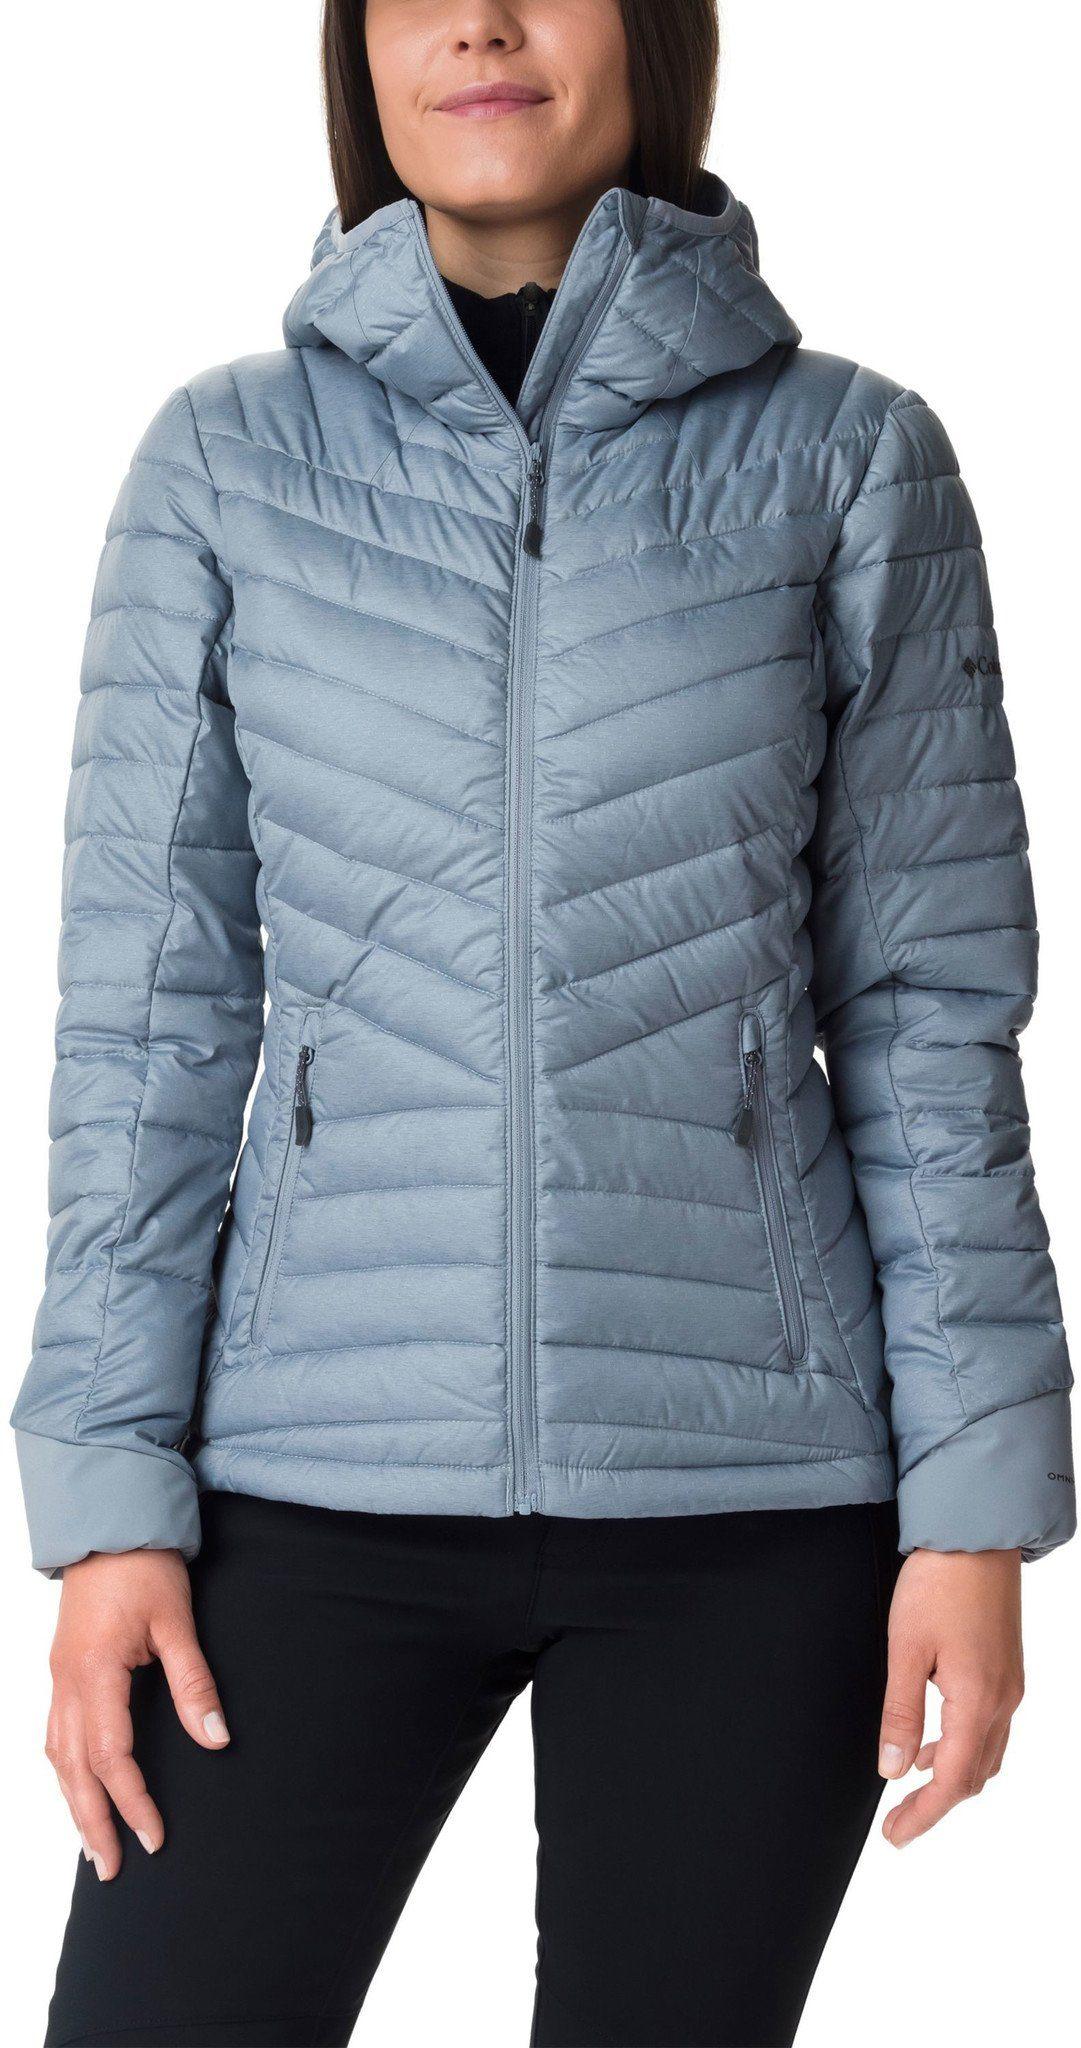 Columbia Outdoorjacke »Windgates Hooded Jacket Damen« online kaufen   OTTO